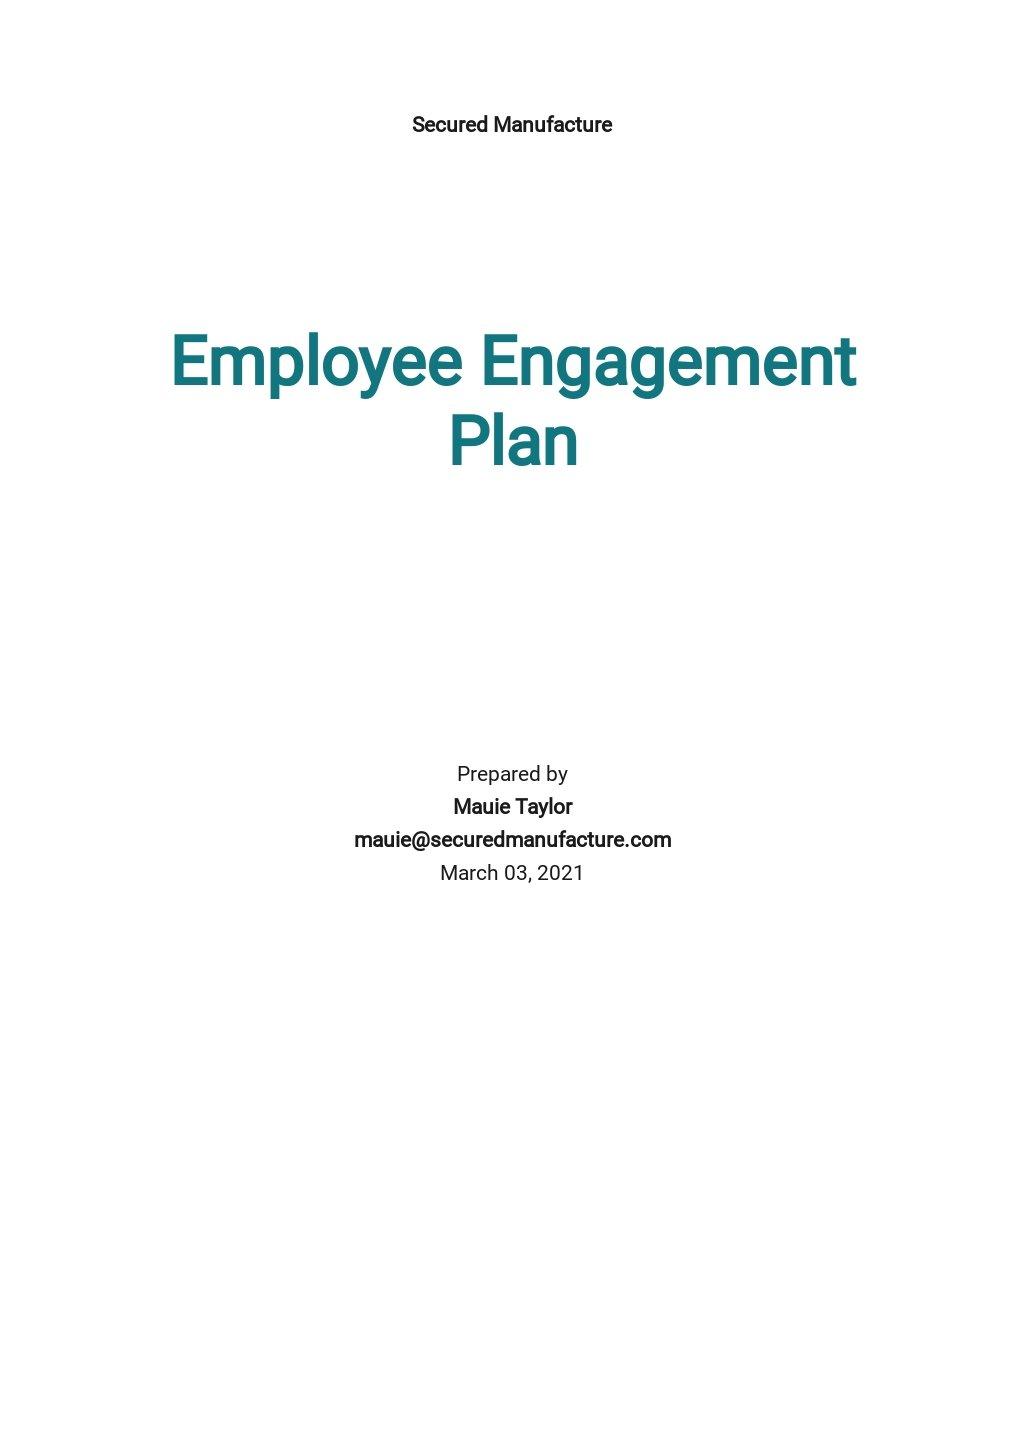 Employee Engagement Plan Template.jpe